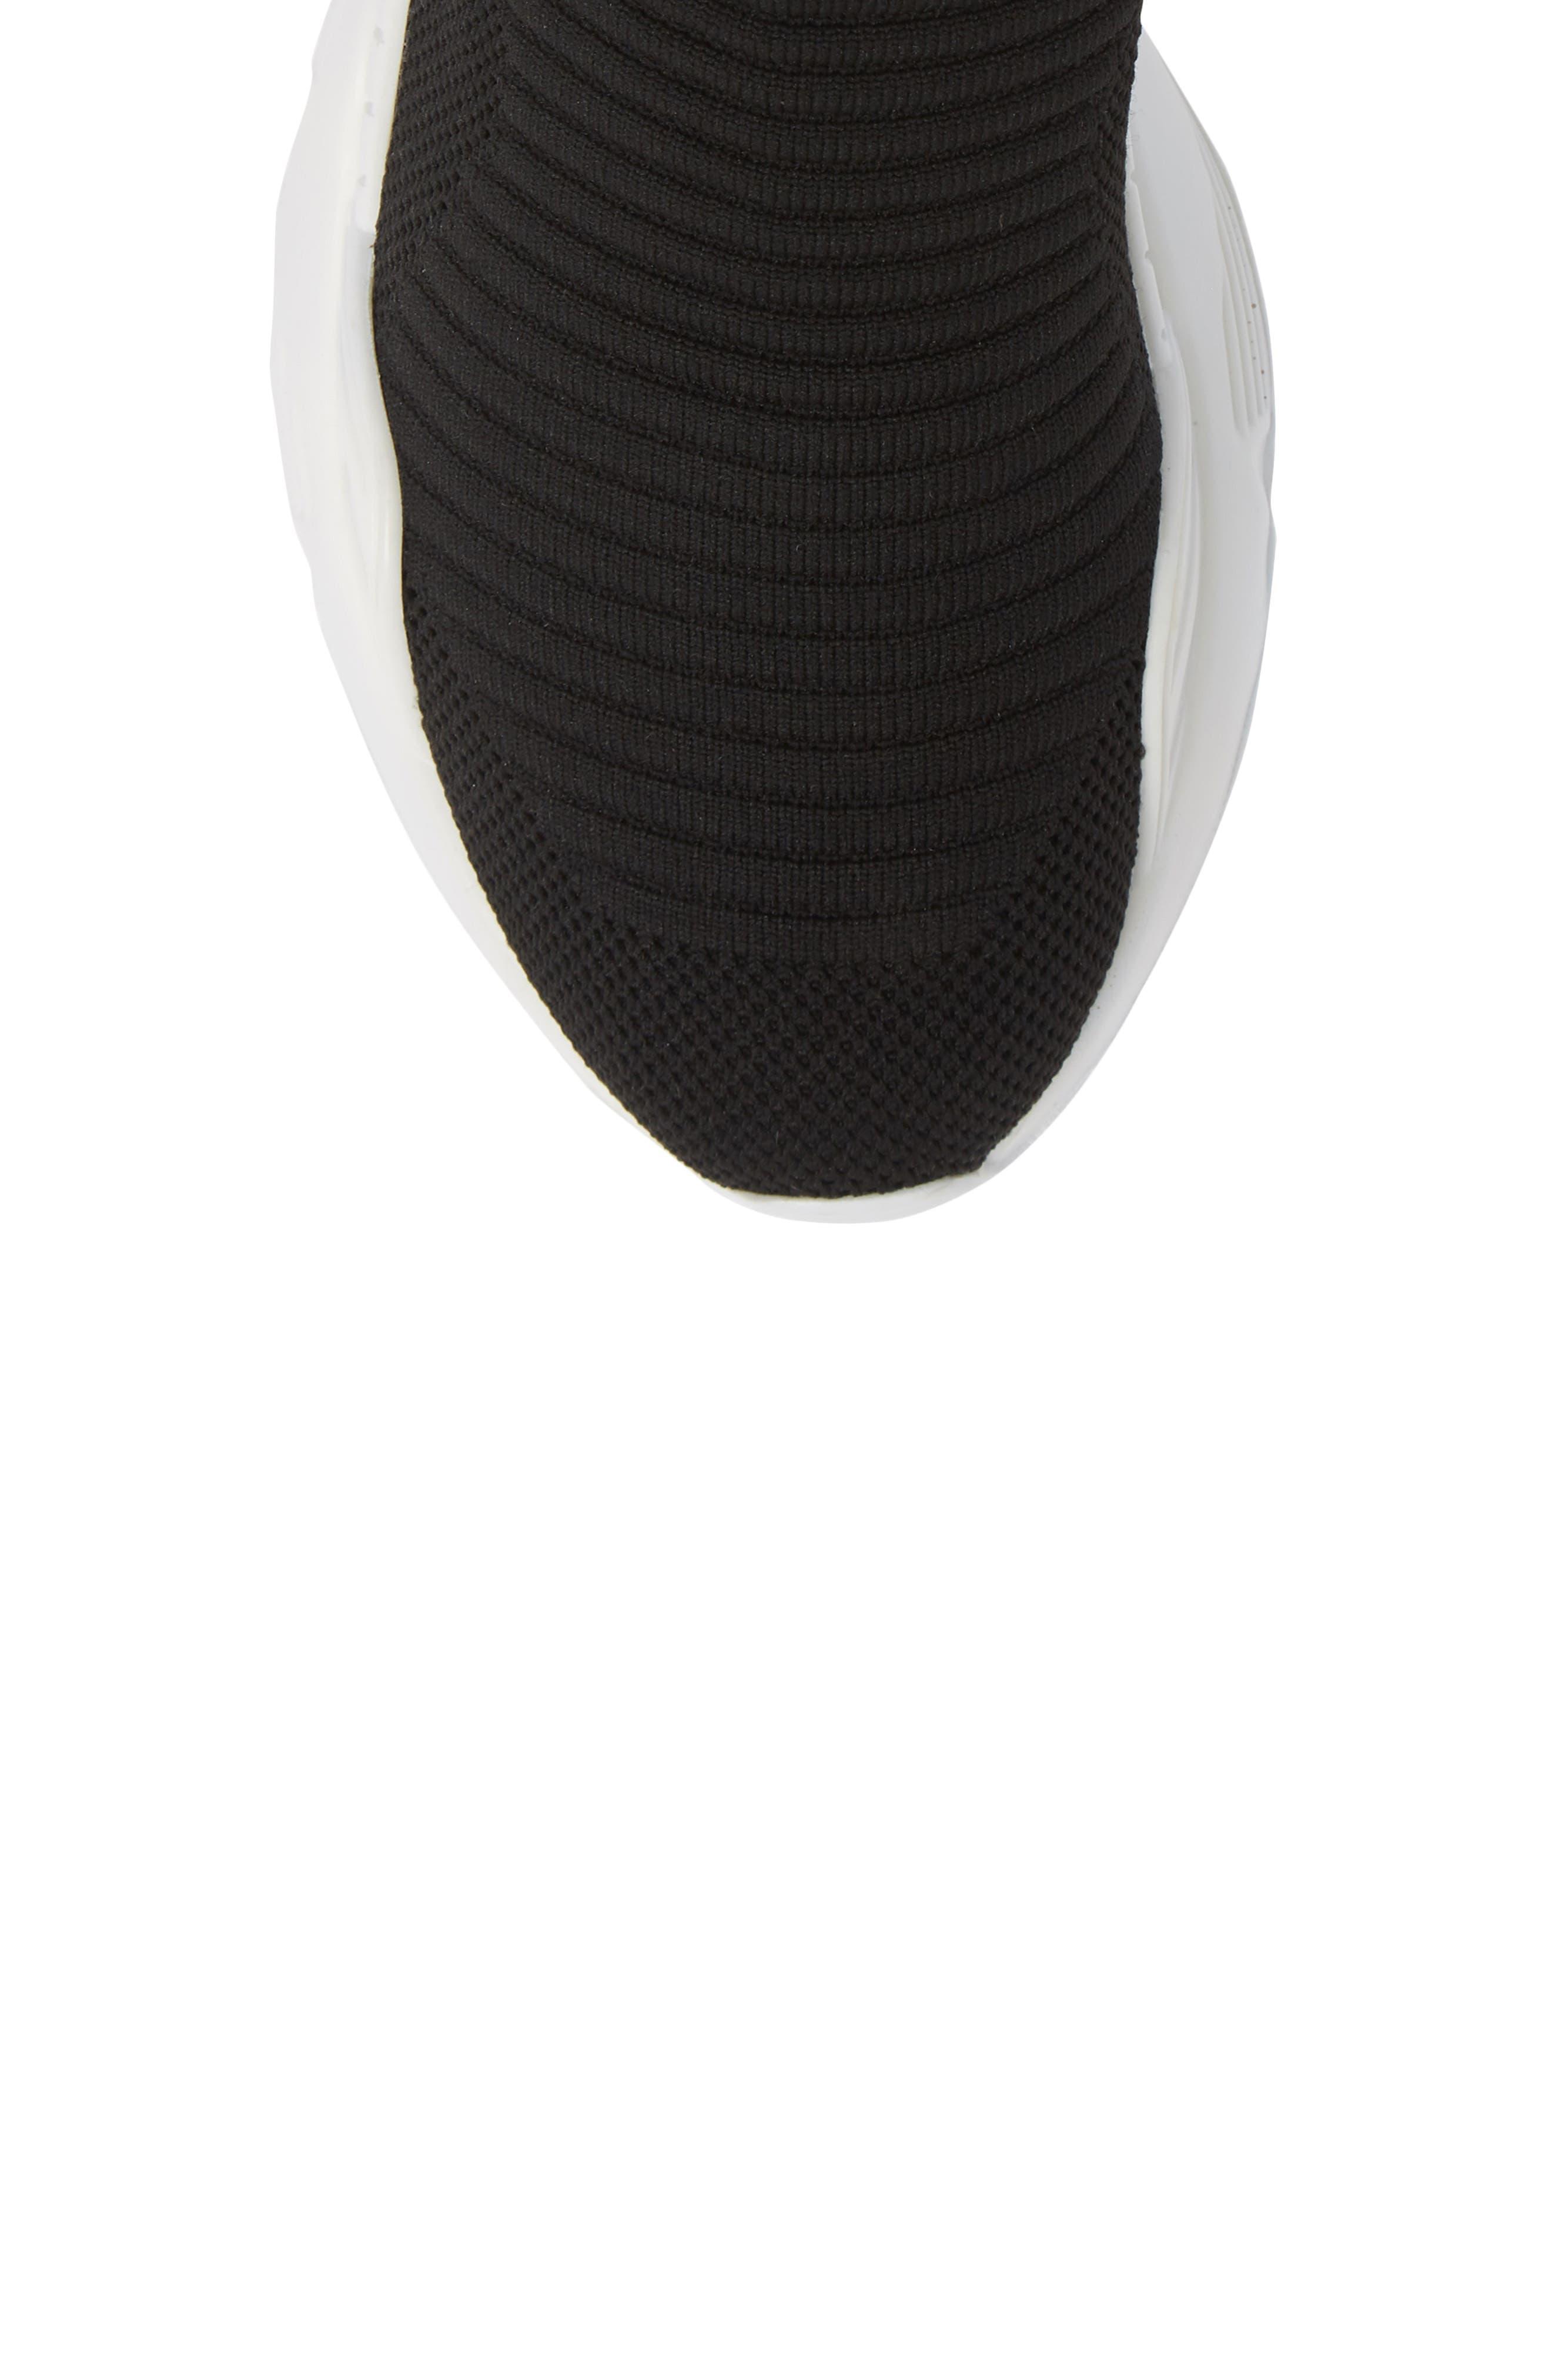 Interweb Cuff Knit Sneaker,                             Alternate thumbnail 5, color,                             014